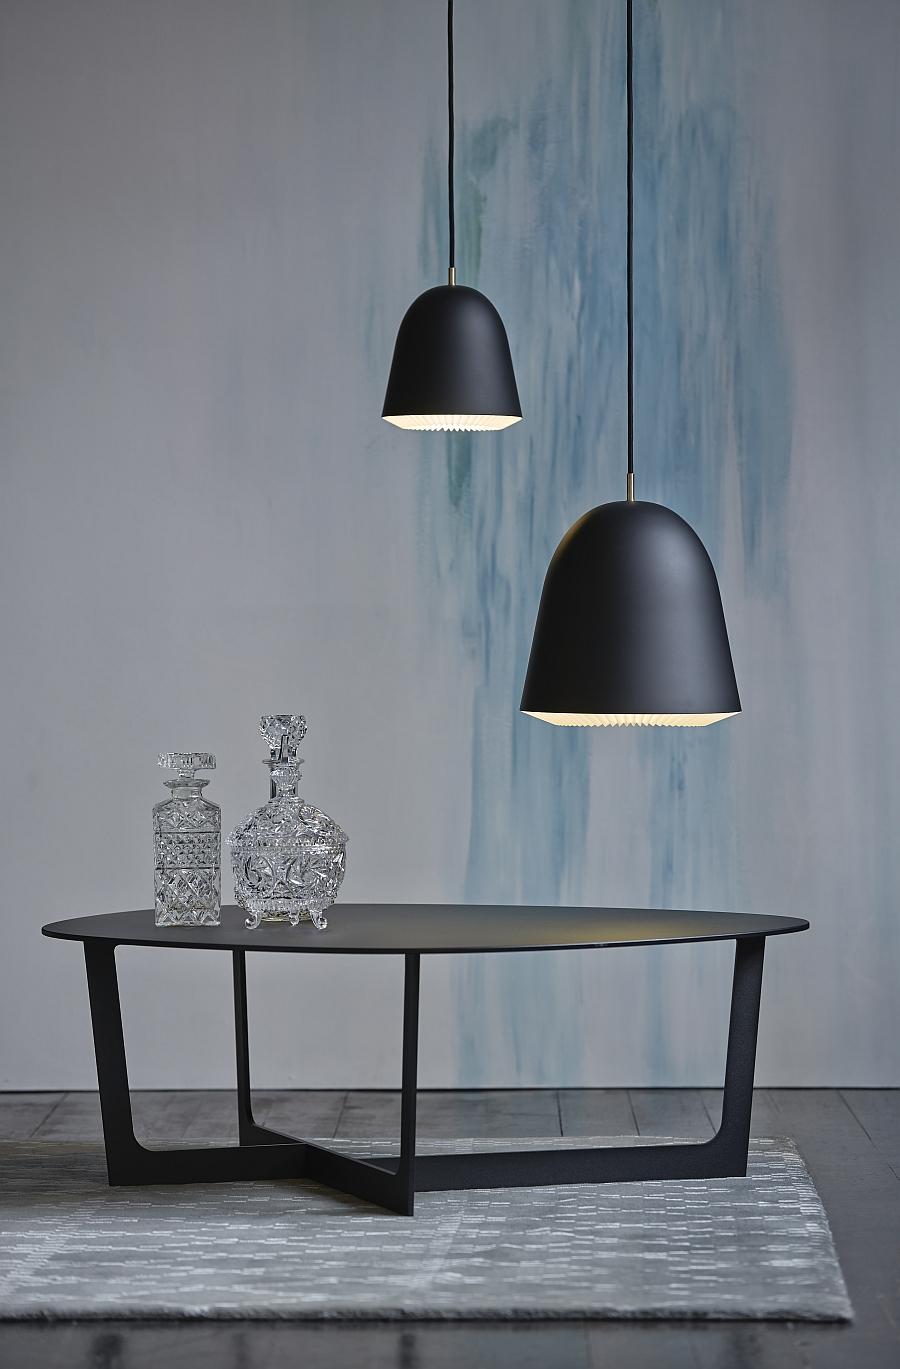 Cache Series designed by French designer Aurélien Barbry